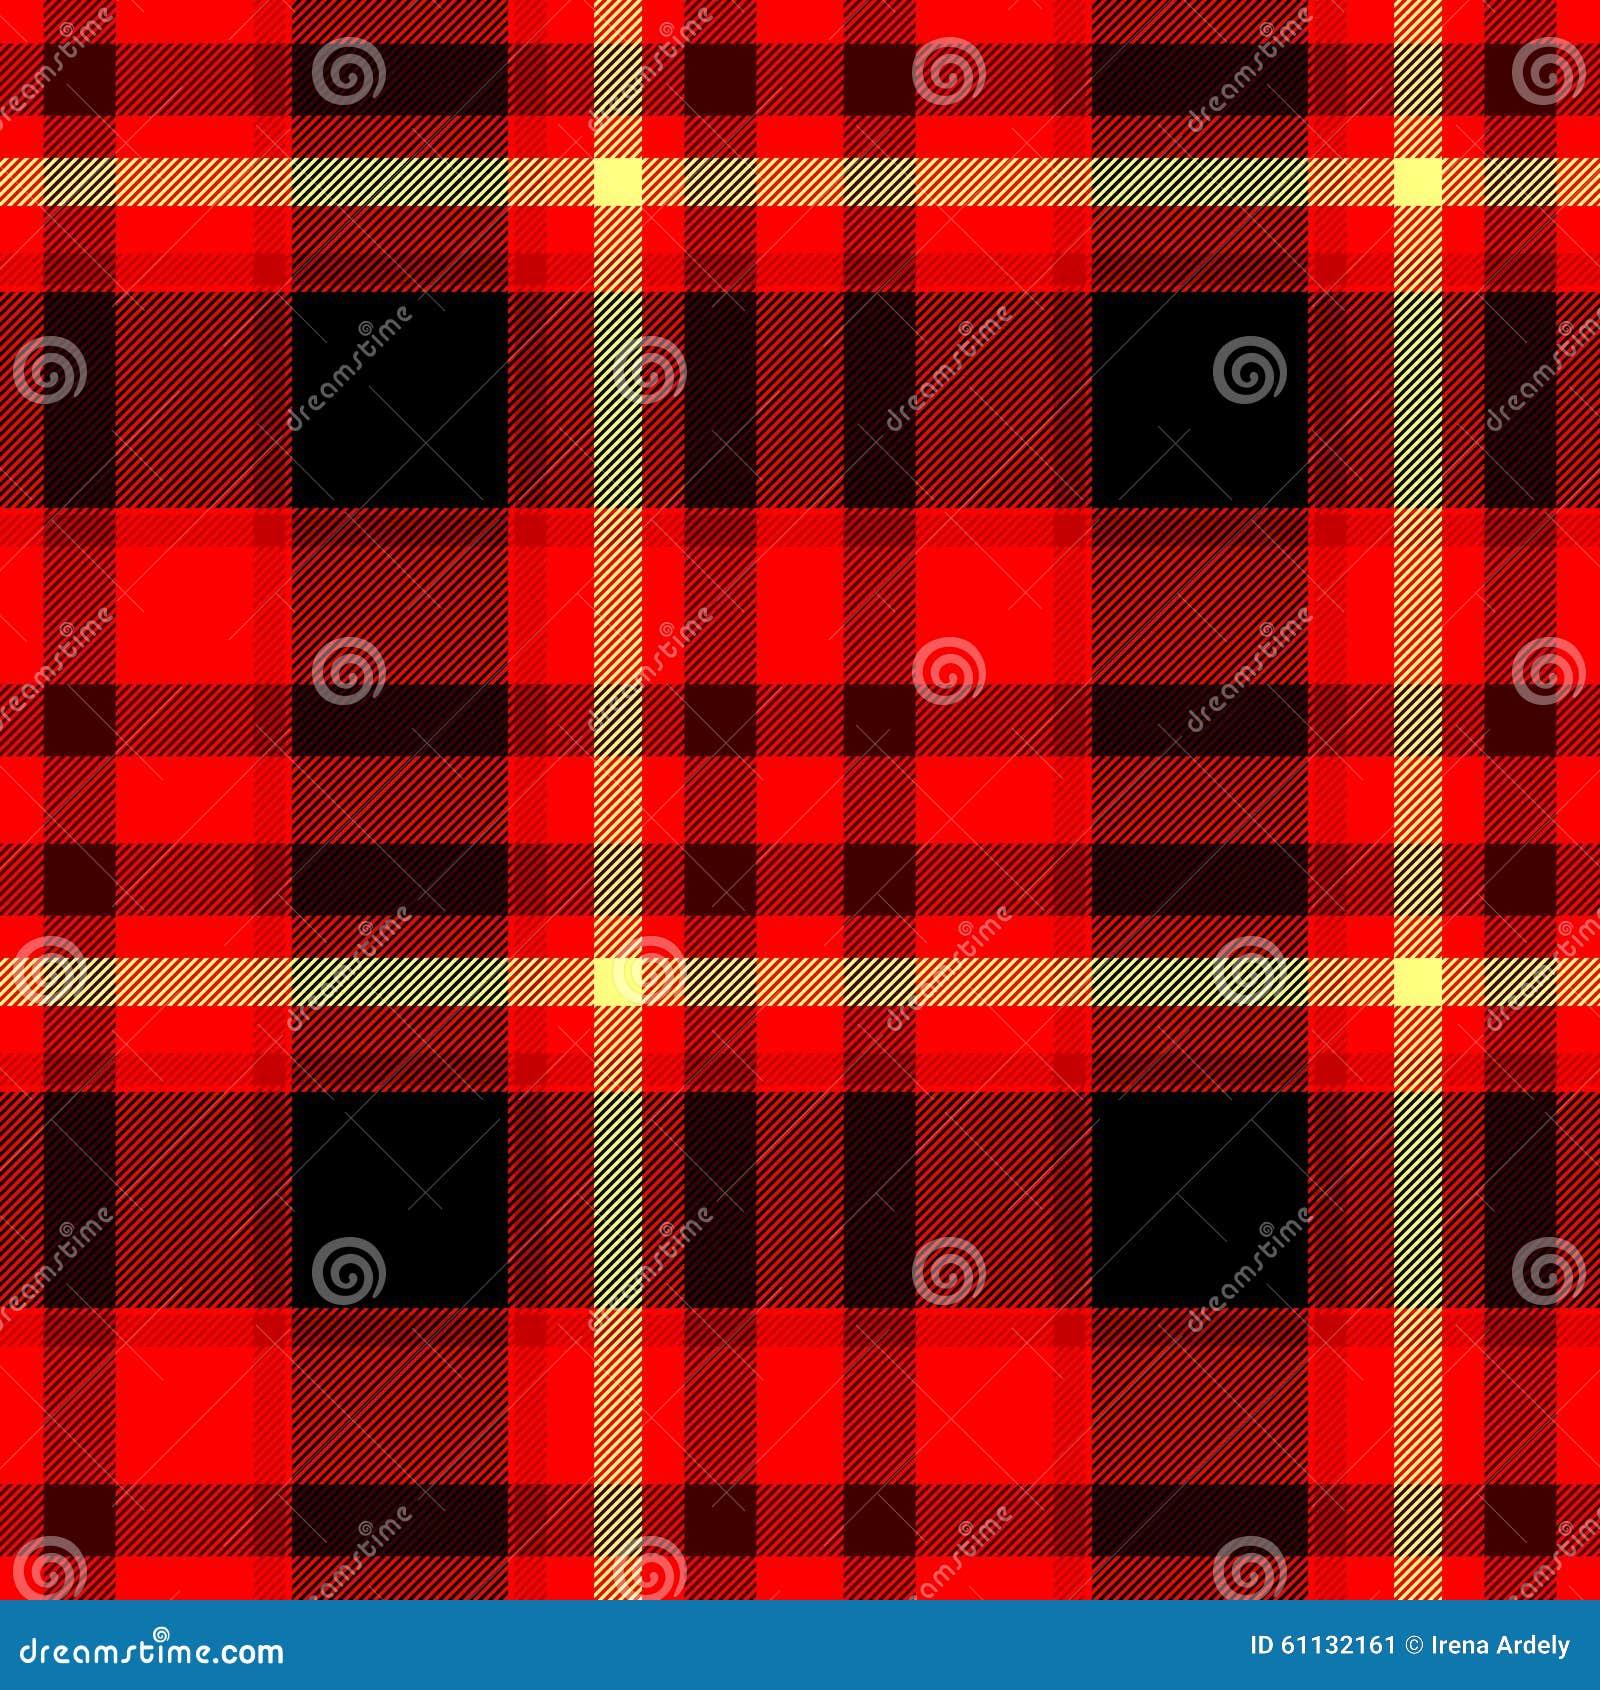 Red Black Yellow Checkered Diamond Tartan Plaid Seamless